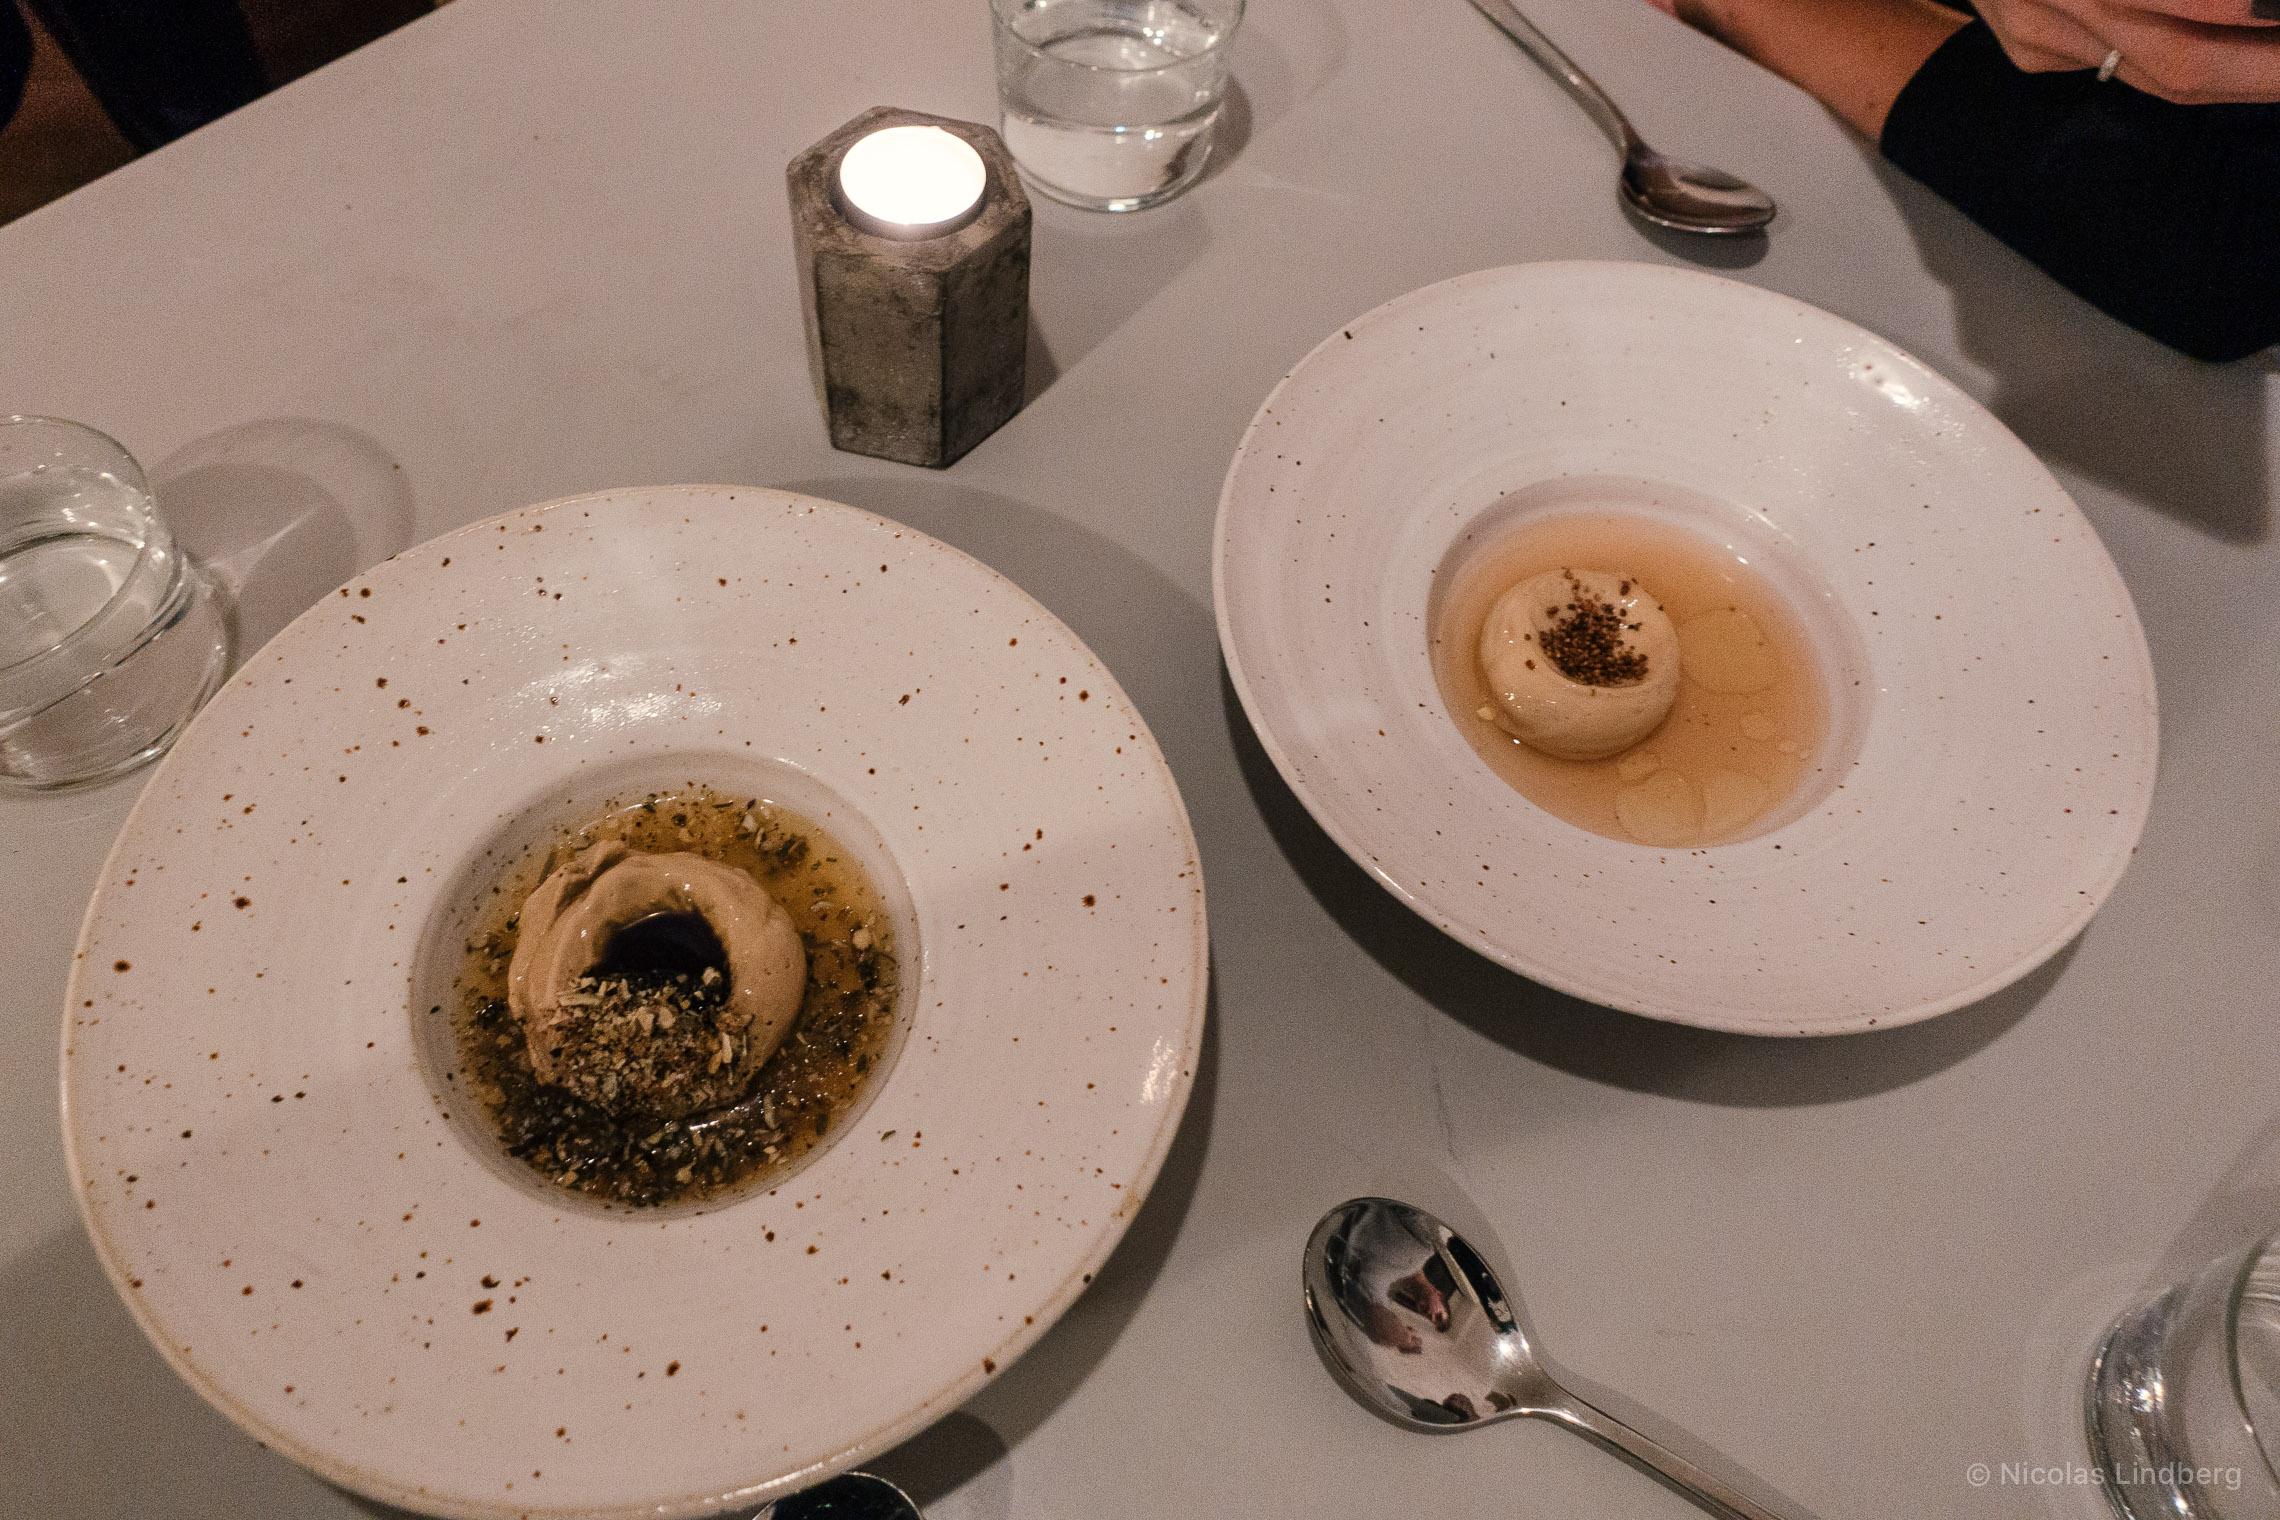 Left: Sourdough Bread Ice Cream 11€   Pumpkin Seed & Tamarind Brittle   Right: Buckwheat Amazake Ice Cream 12€   Sobcha' Tea. Mandarin Oil